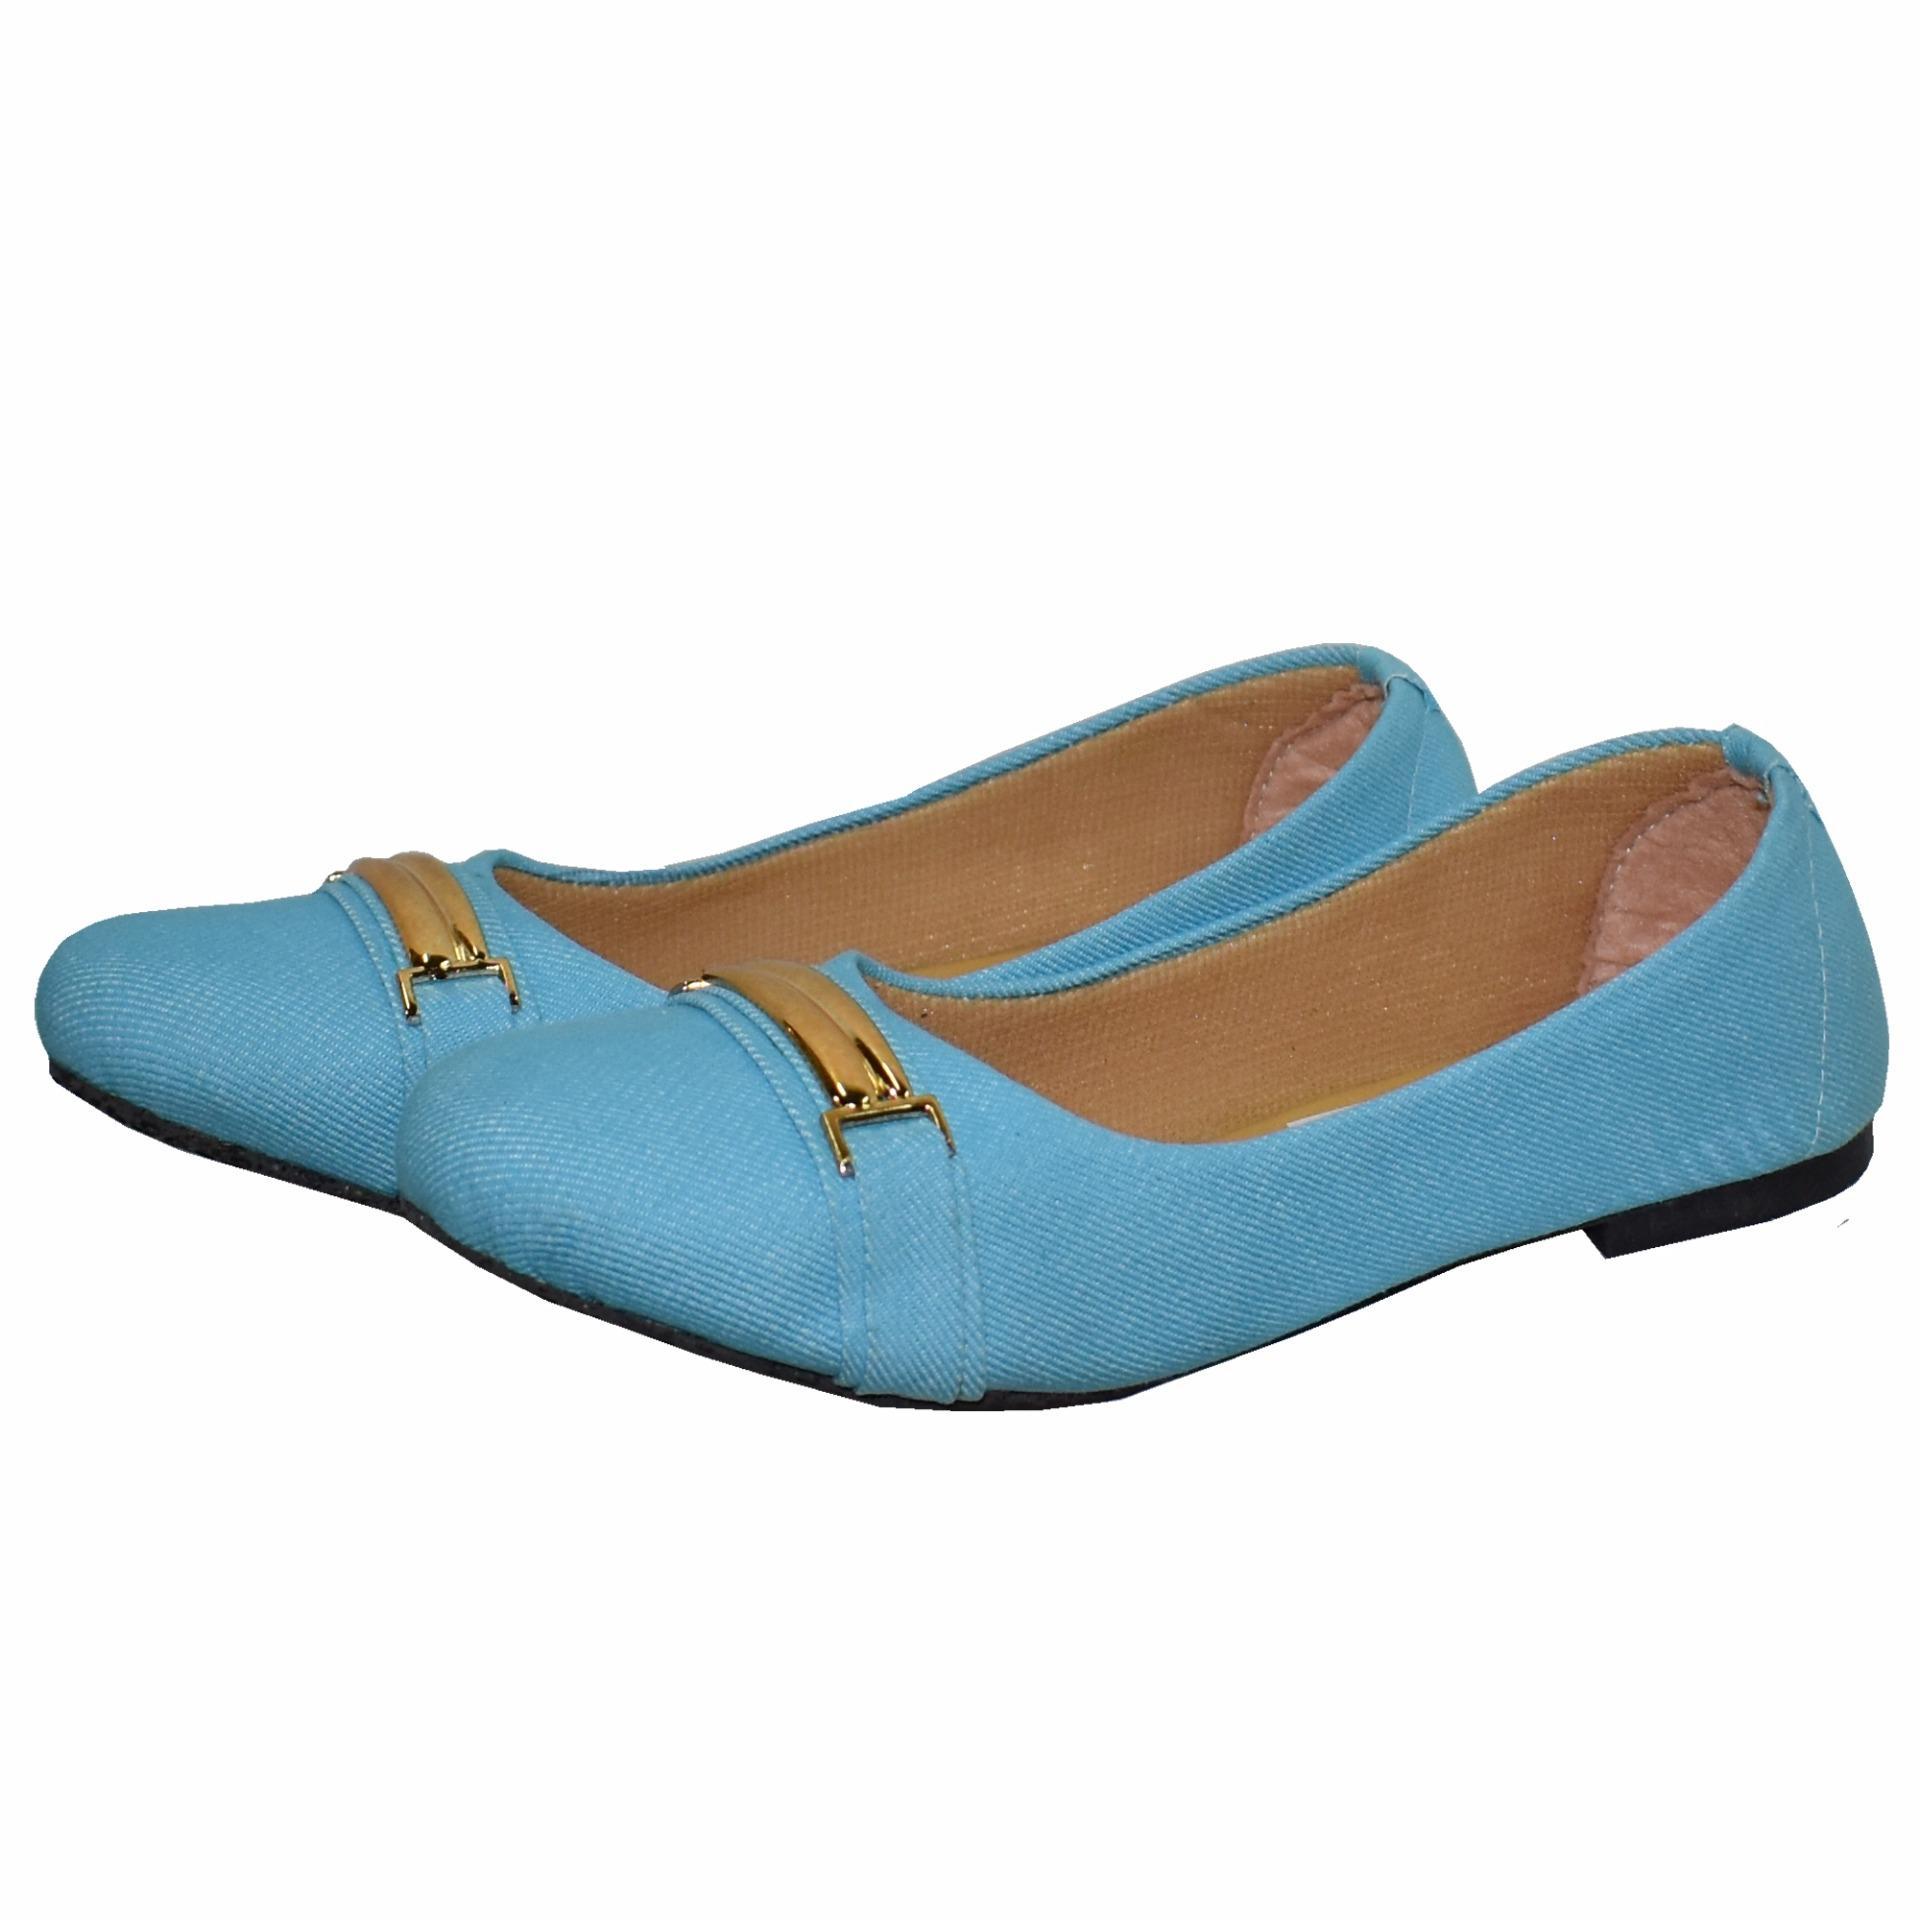 Woman Choice Flat Shoes Develop 12 - Sepatu Balet - Abu-Abu Free Sandals.